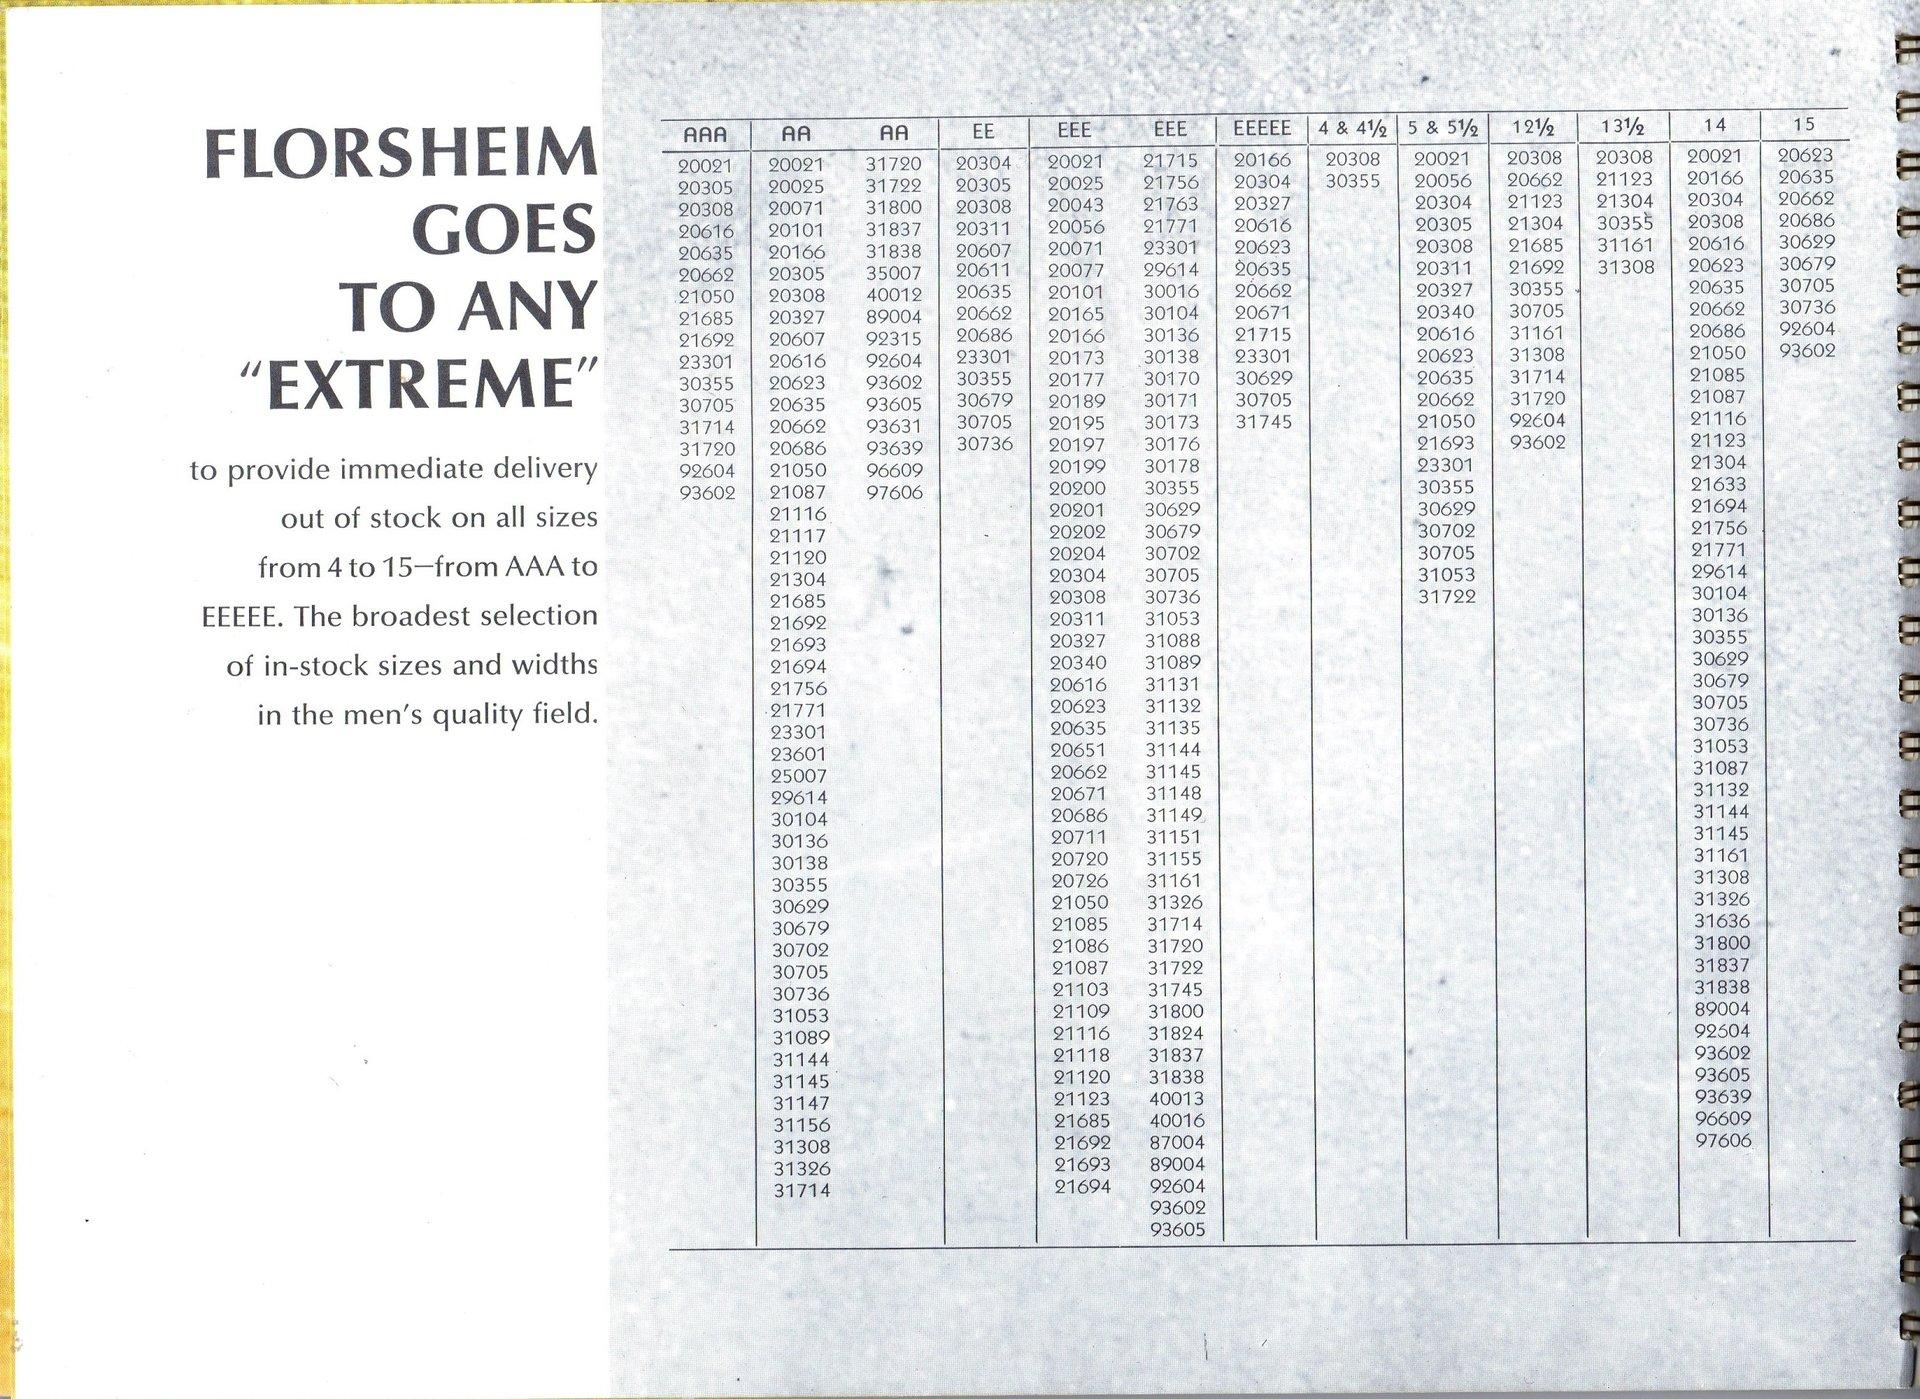 Florsheim extreme sizes